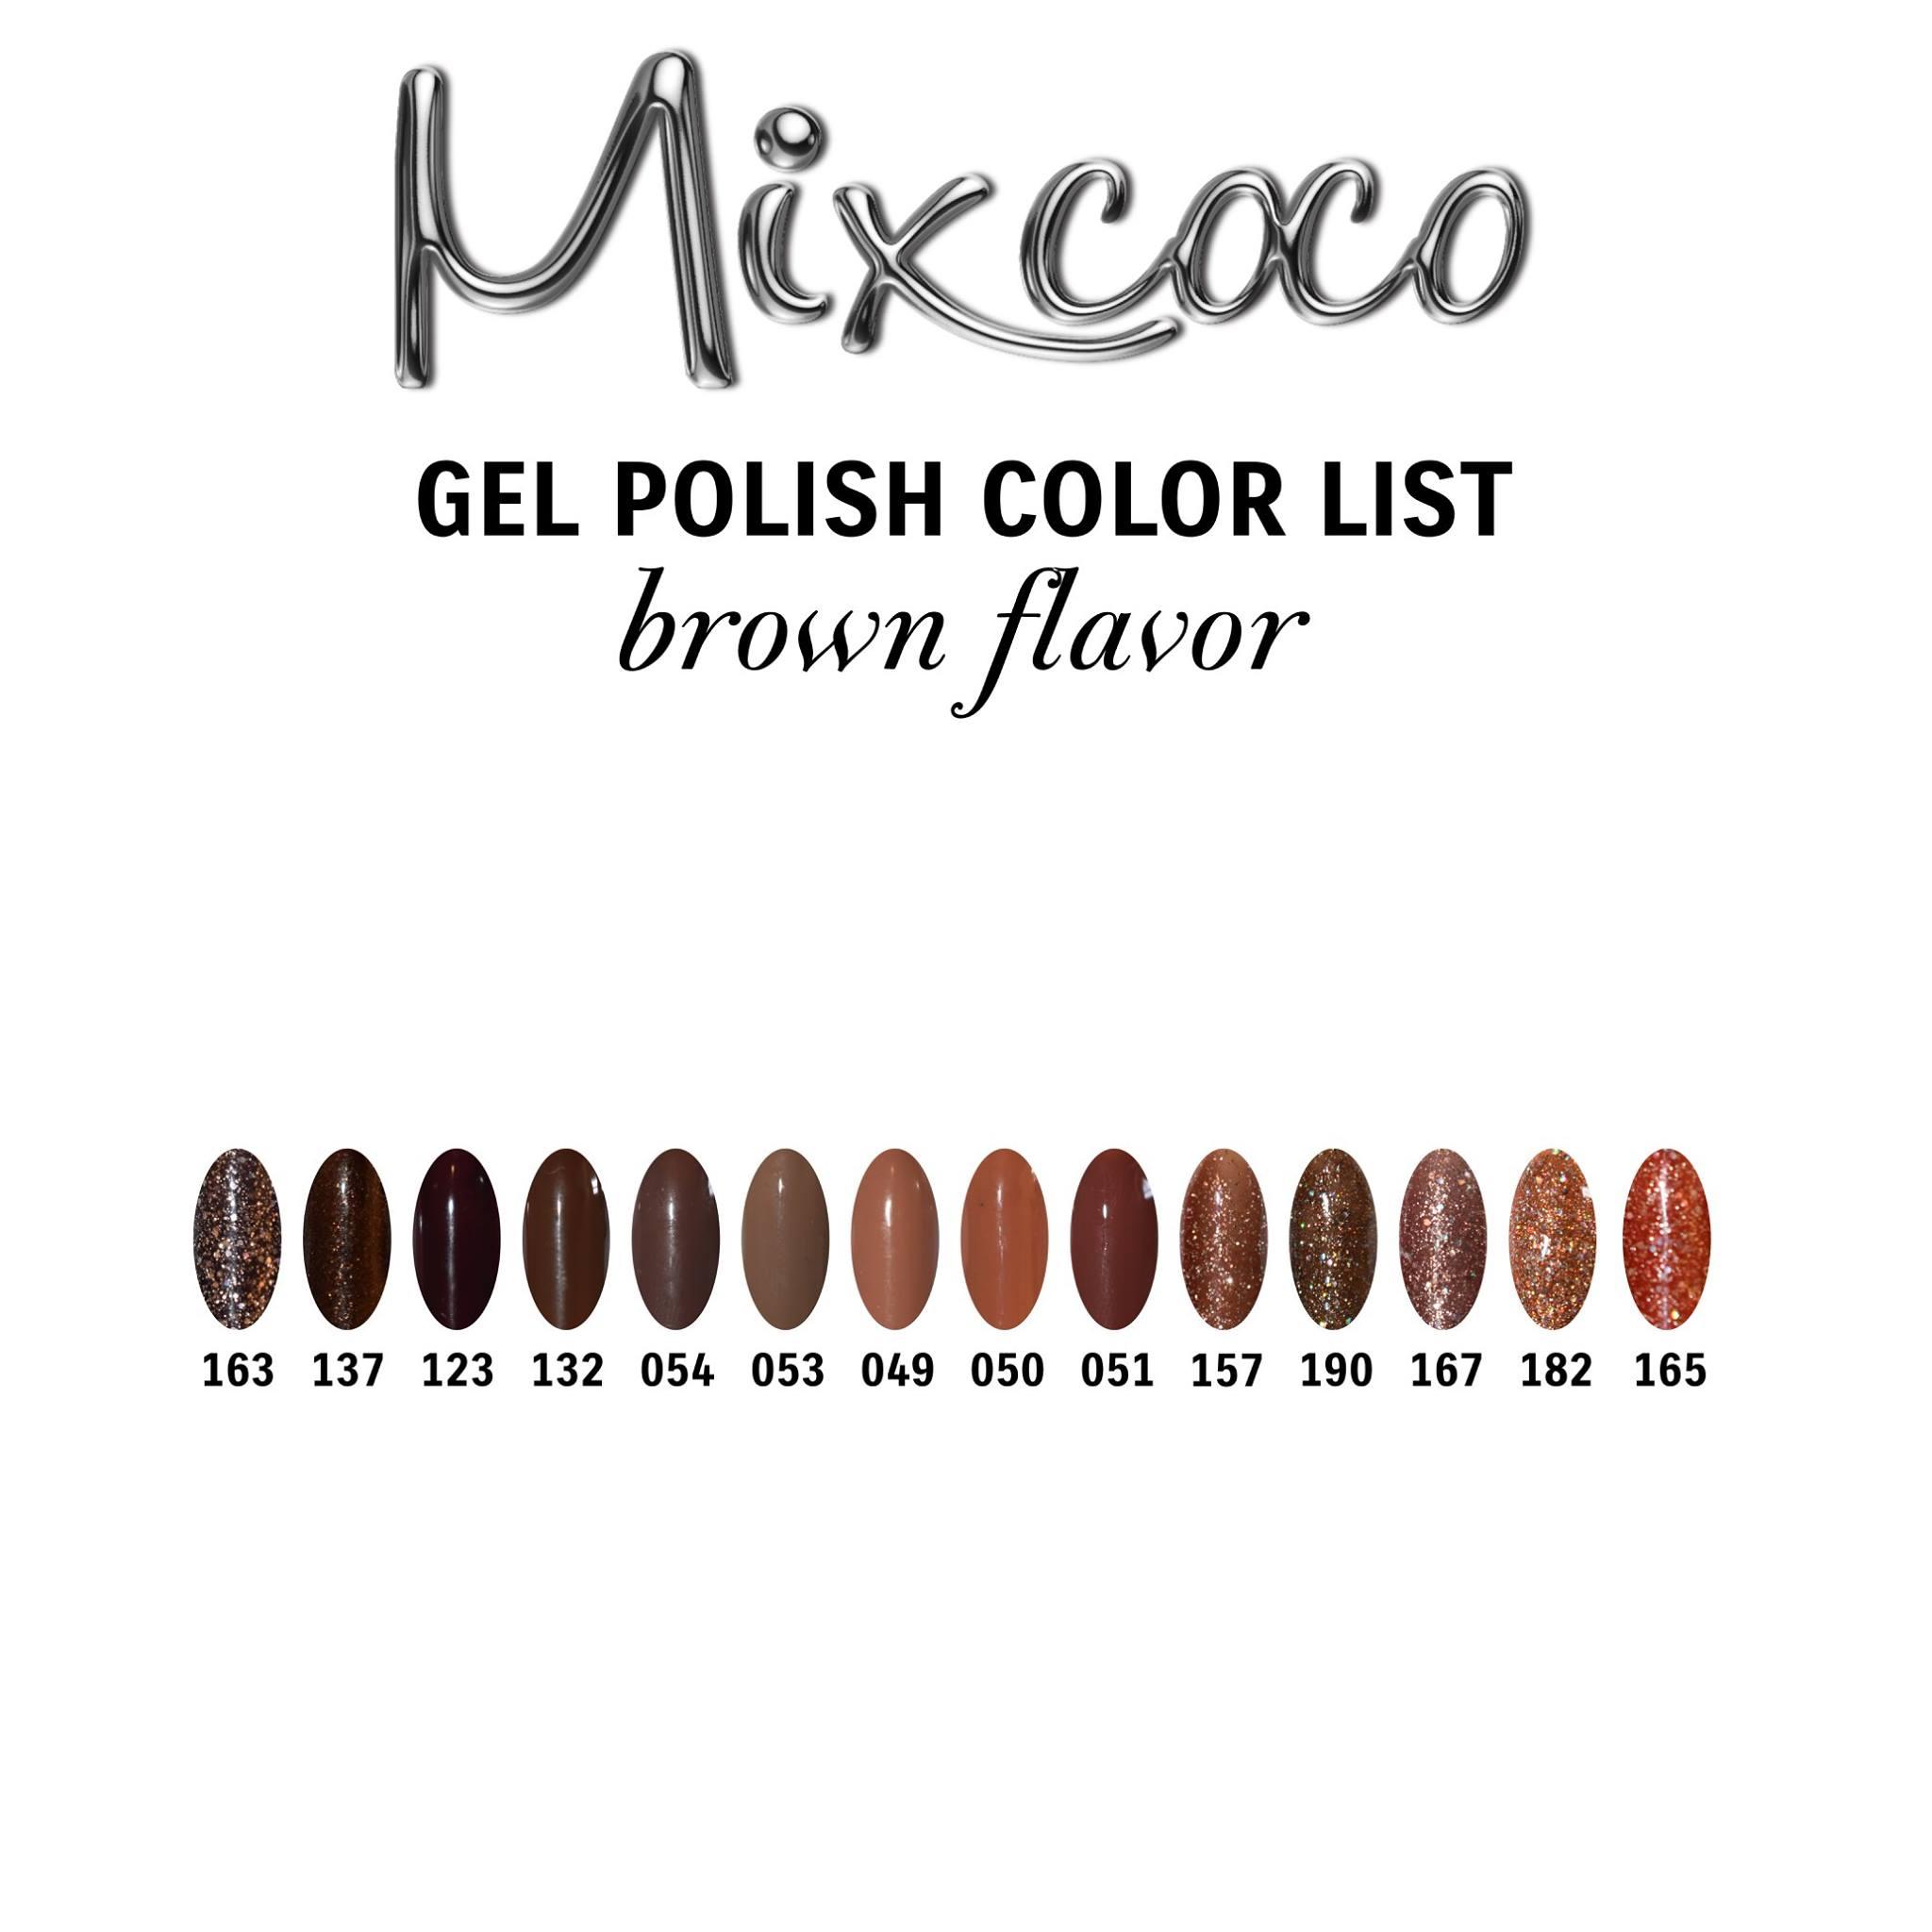 Gel Polish Color List - Brown Flavor